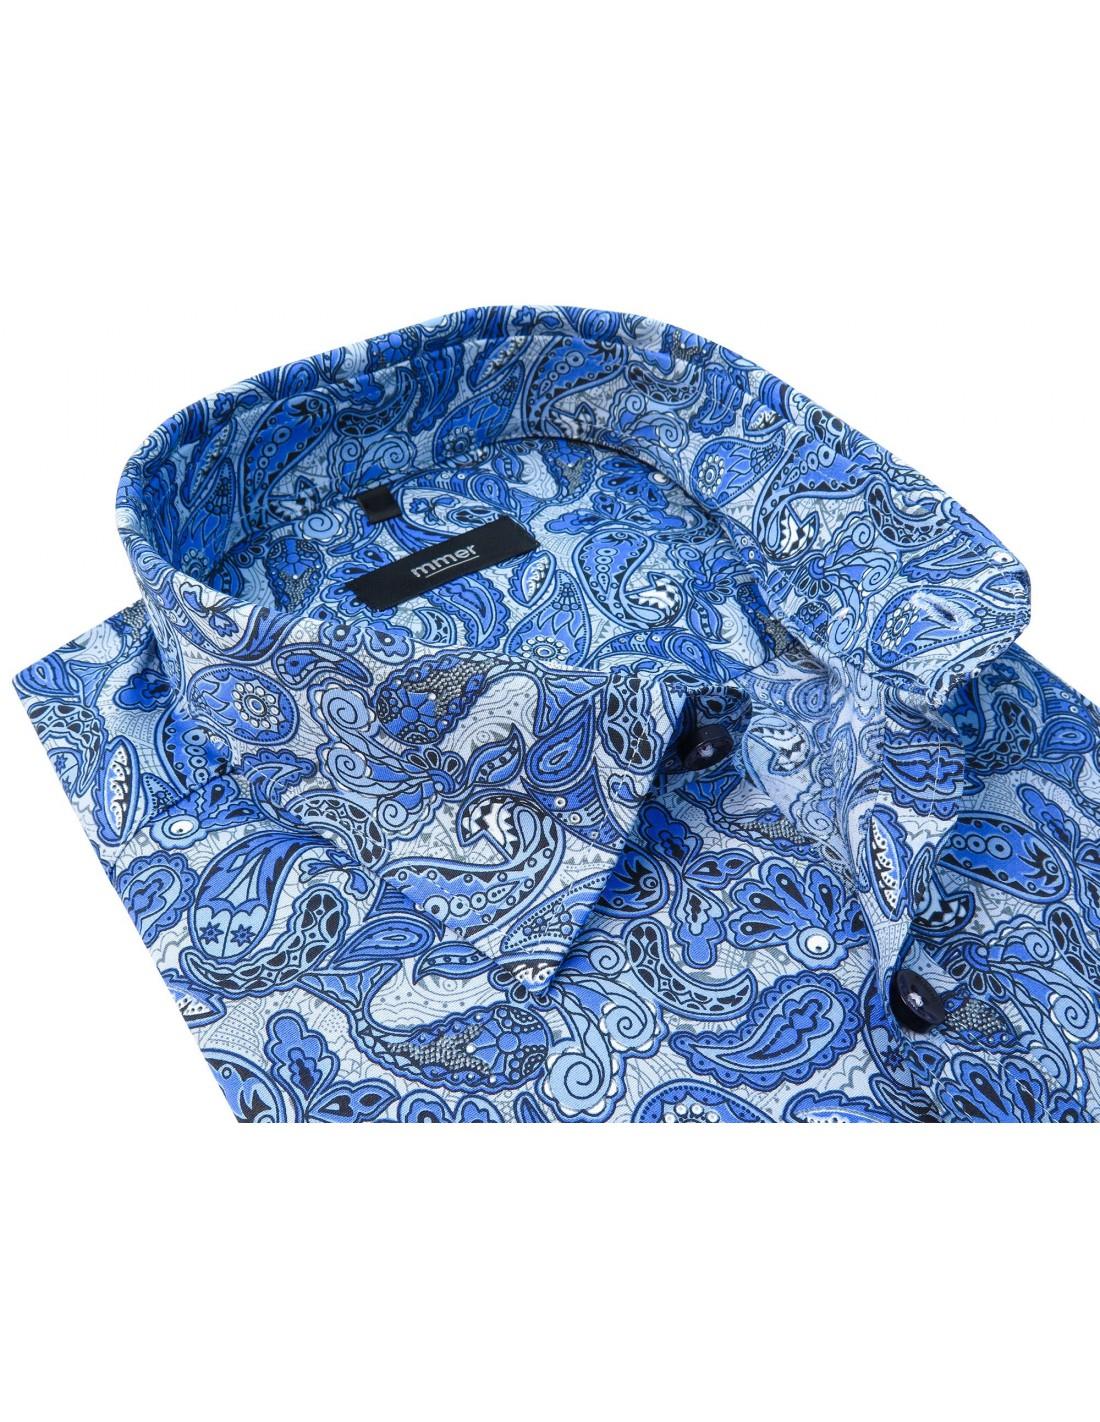 Koszula męska rozmiar M 3940 elegancka paisley